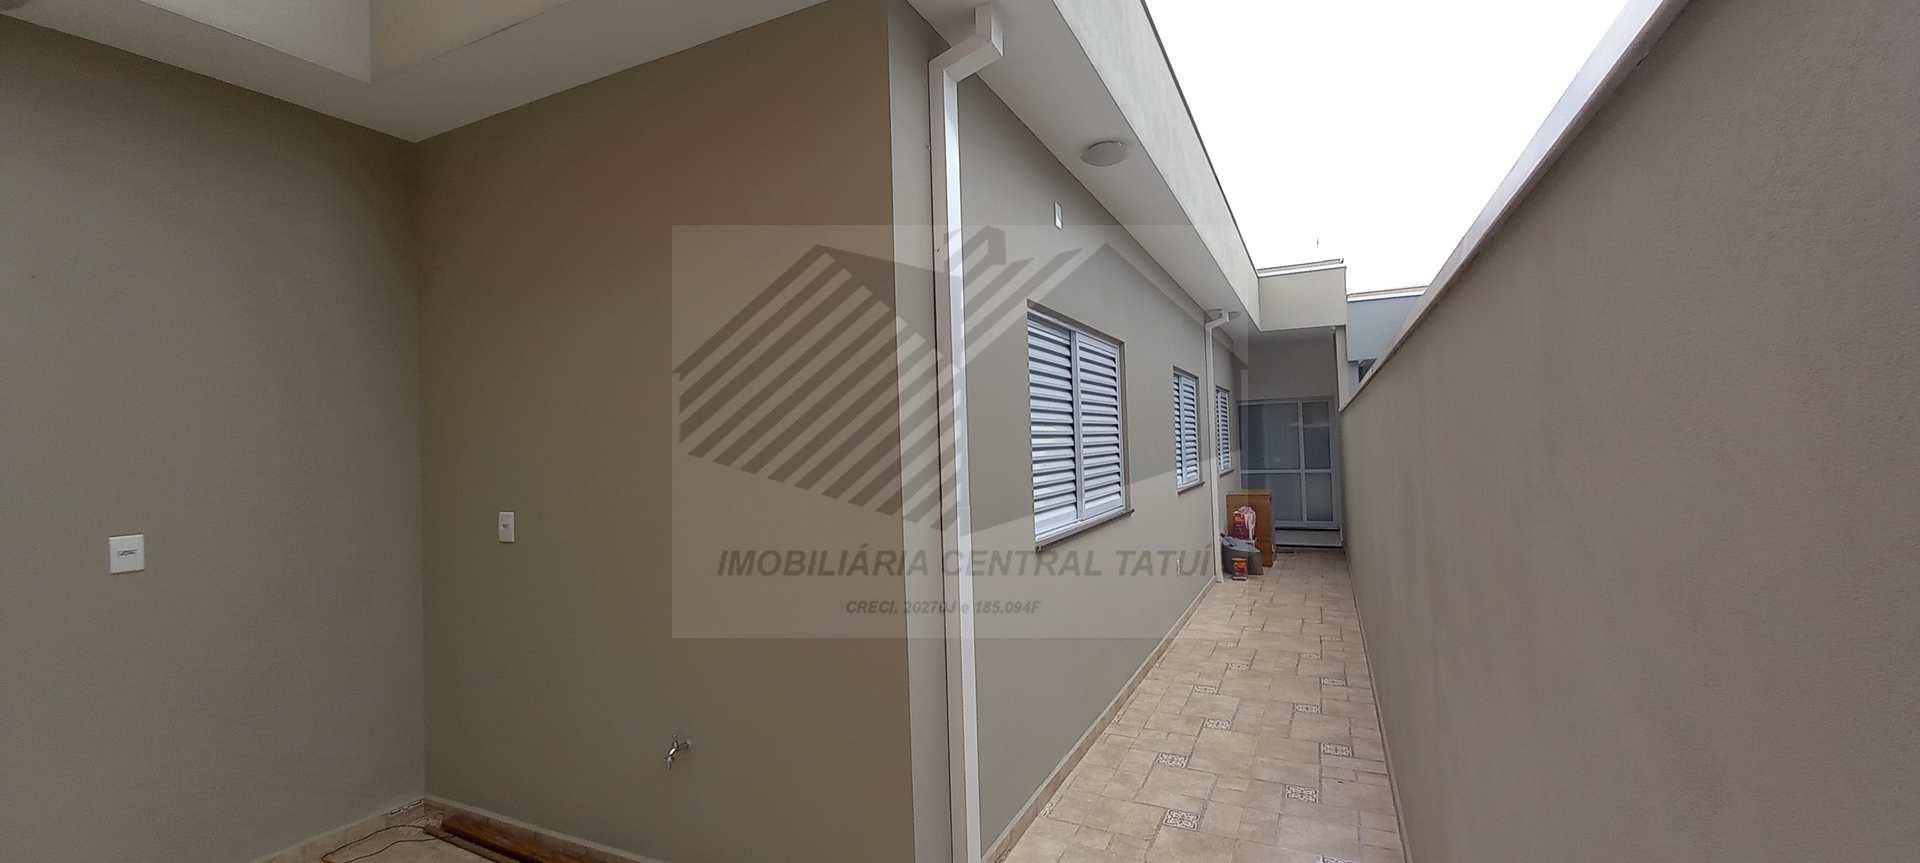 Casa com 3 dorms, Jardim Mantovani, Tatuí, Cod: 708